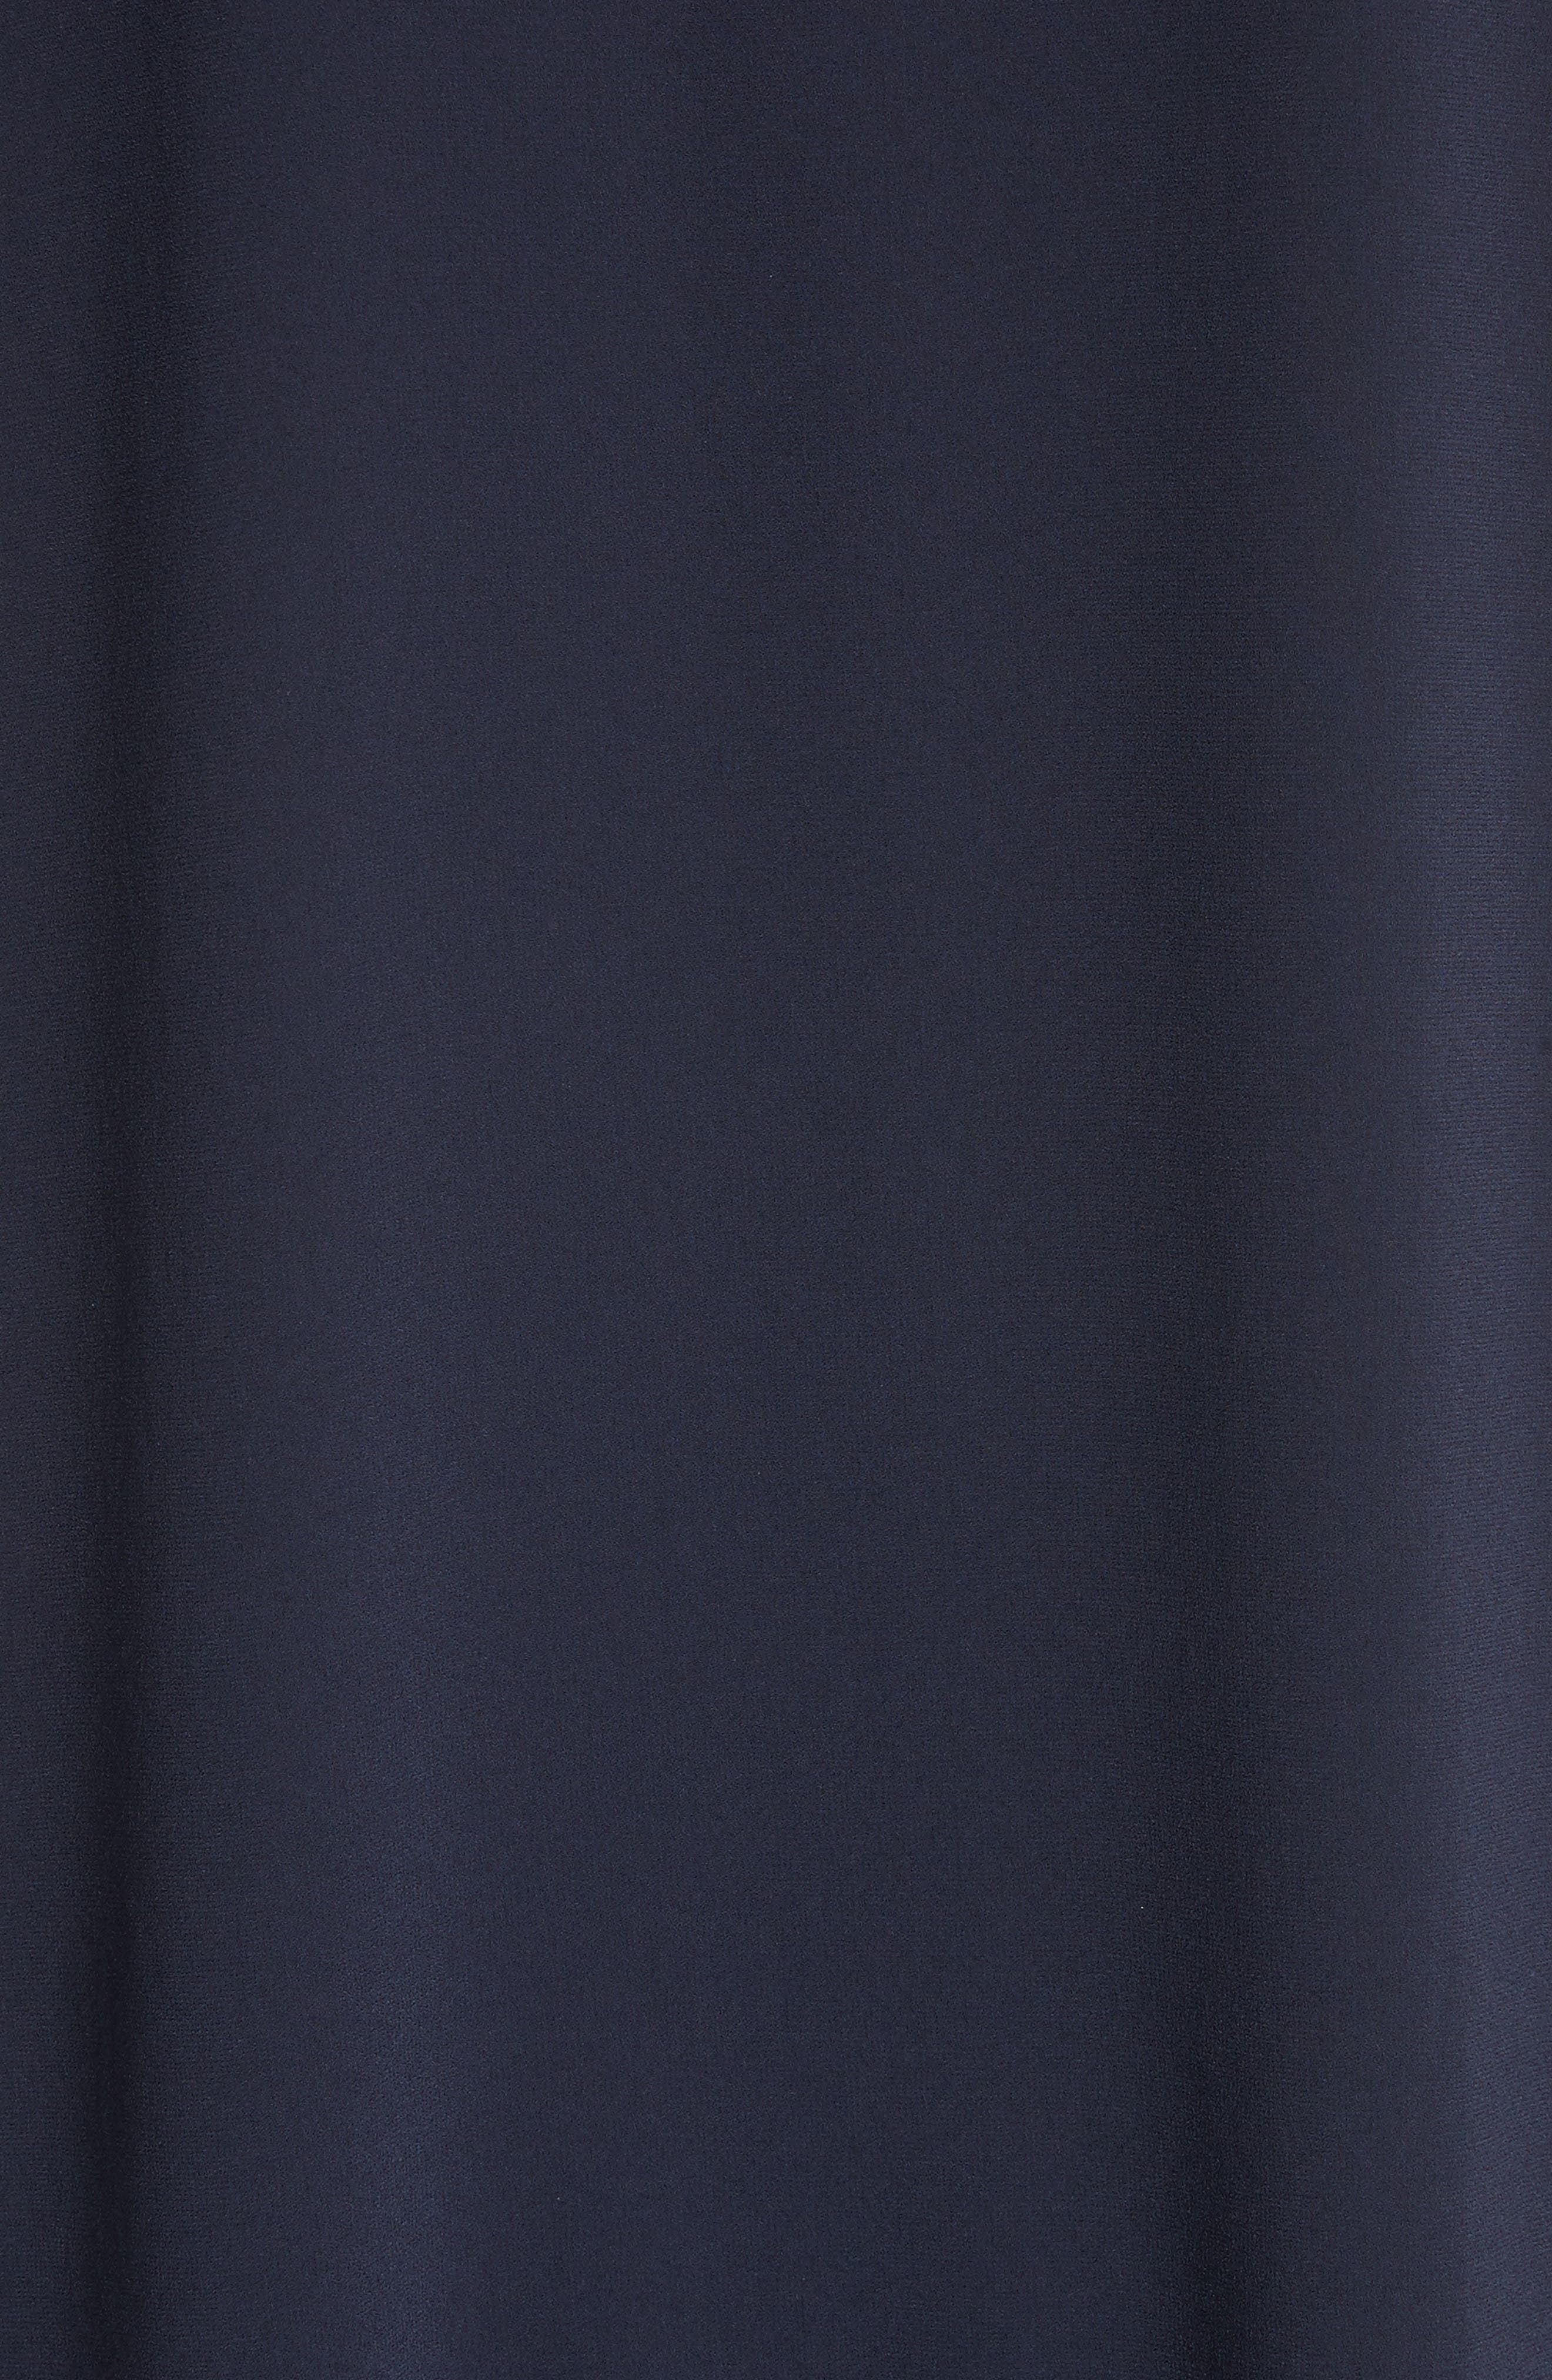 Asymmetrical Satin Back Crepe Top,                             Alternate thumbnail 6, color,                             Navy